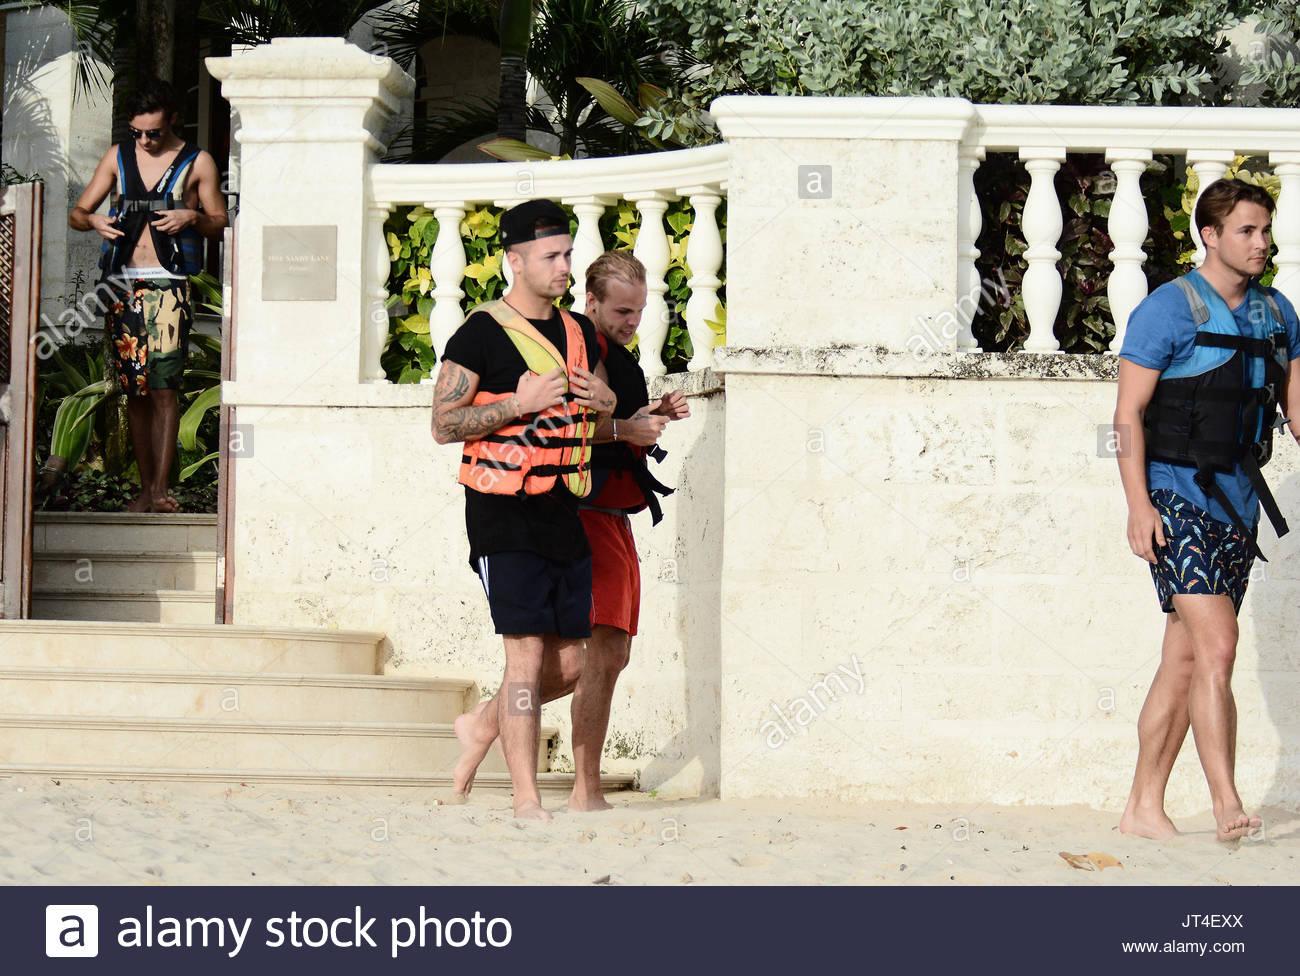 Jaymi Hensley And Olly Marmon Wedding: Jaymi Hensley Stock Photos & Jaymi Hensley Stock Images